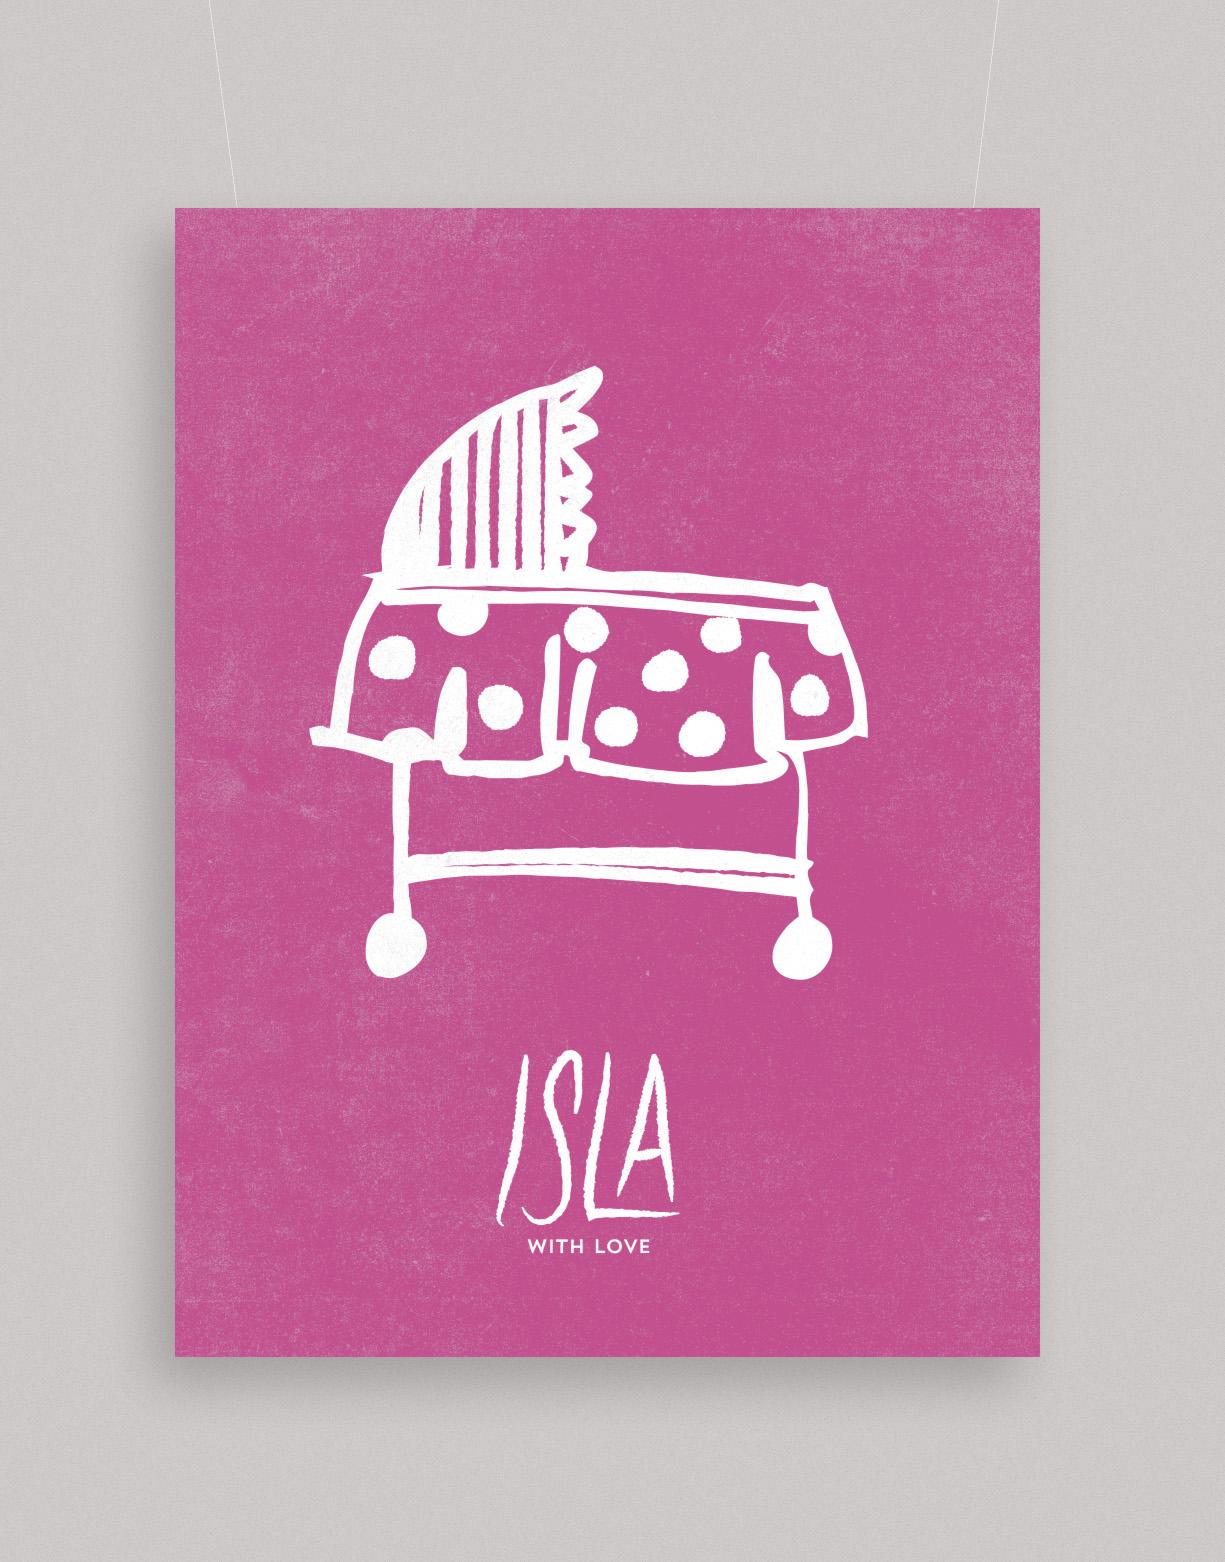 Posters_Isla 05.jpg